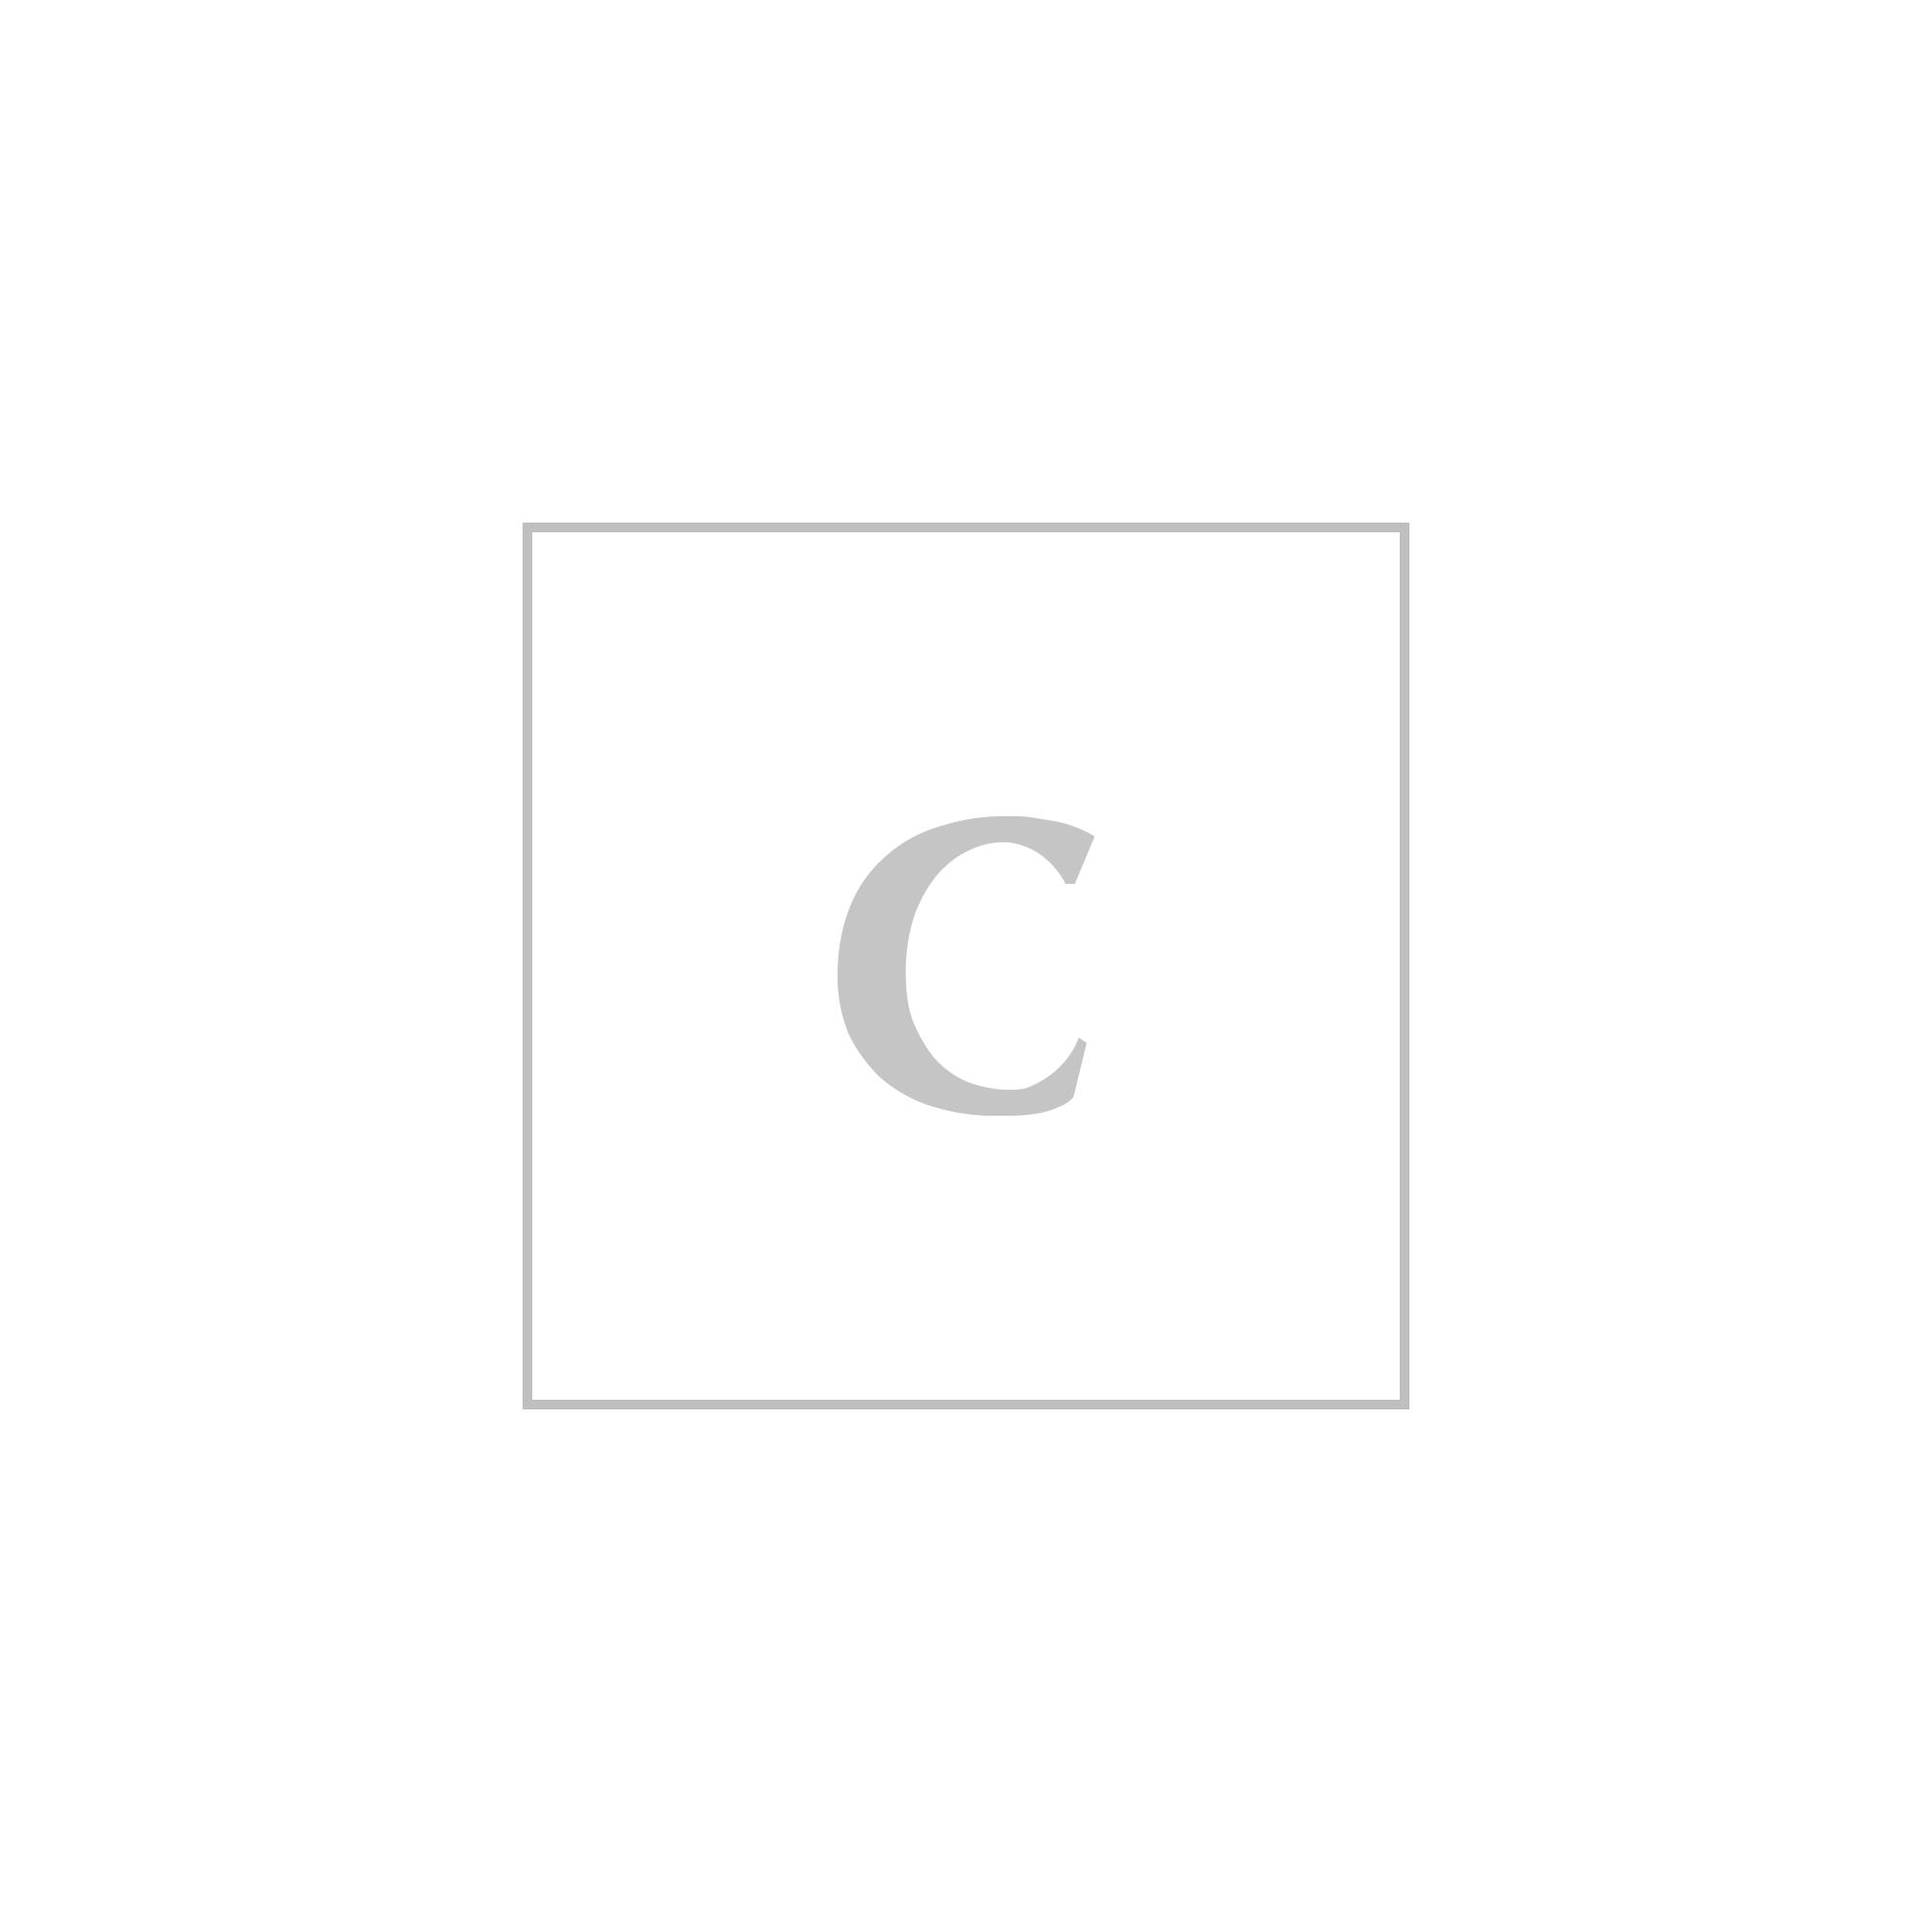 UJUNAOR Cappotto Uomo,Cappotto con Bottoni Ricamati in Stile Gotico,Slim Fit,Tinta Unita,S//M//L//XL//XXL//XXXL//XXXXL//XXXXXL